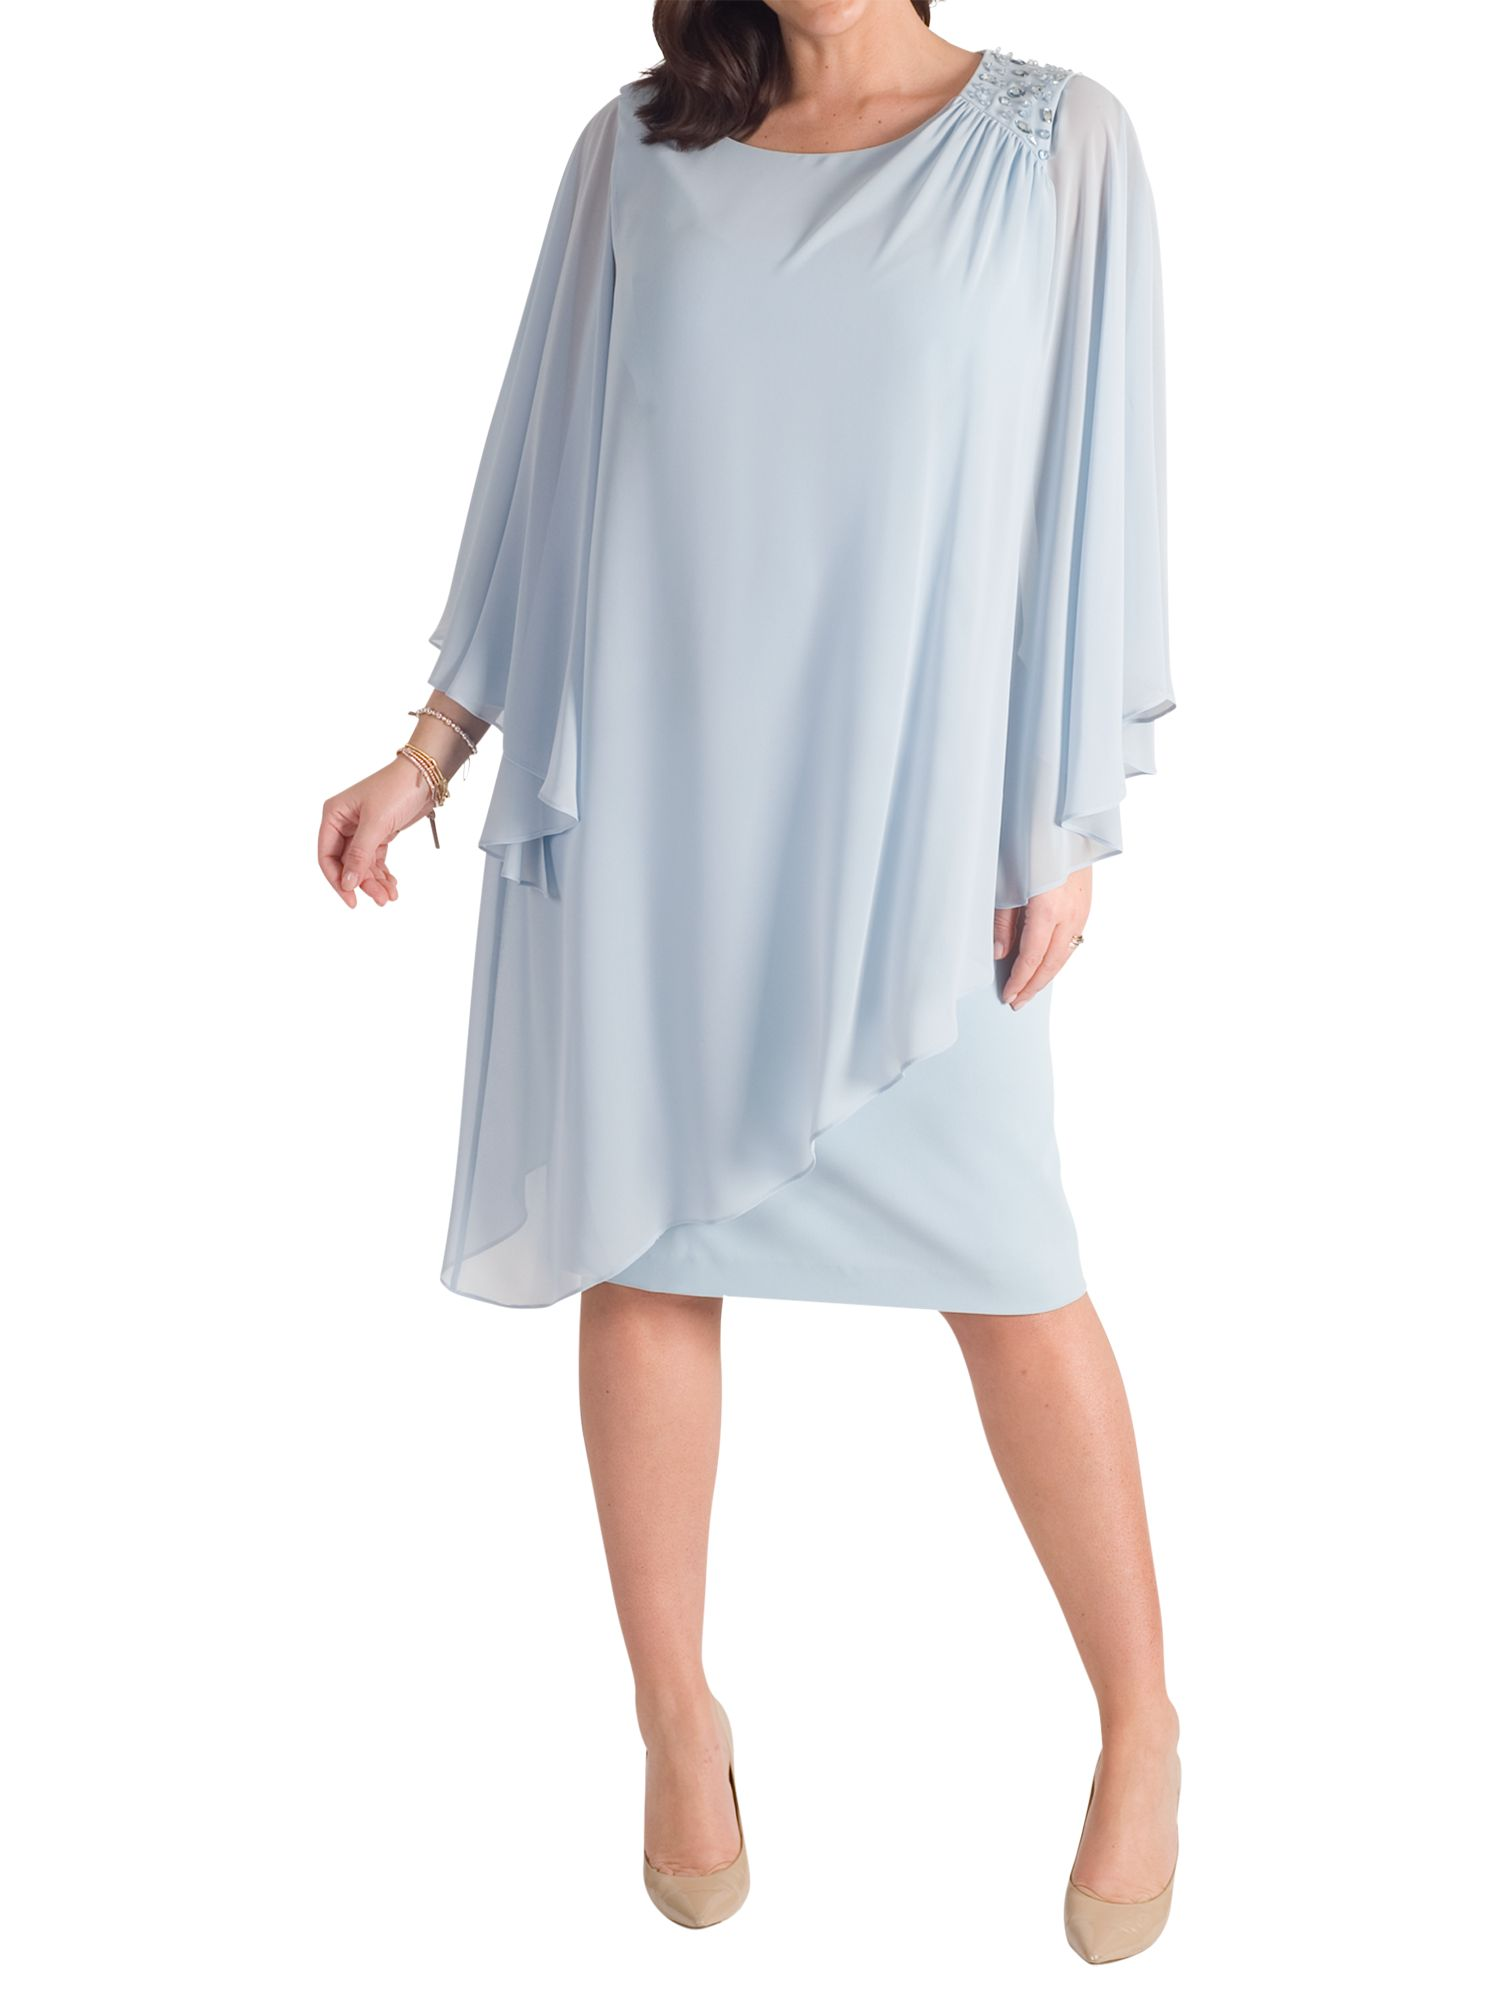 Chesca Chesca Chiffon Layer Bead Shoulder Dress, Aqua